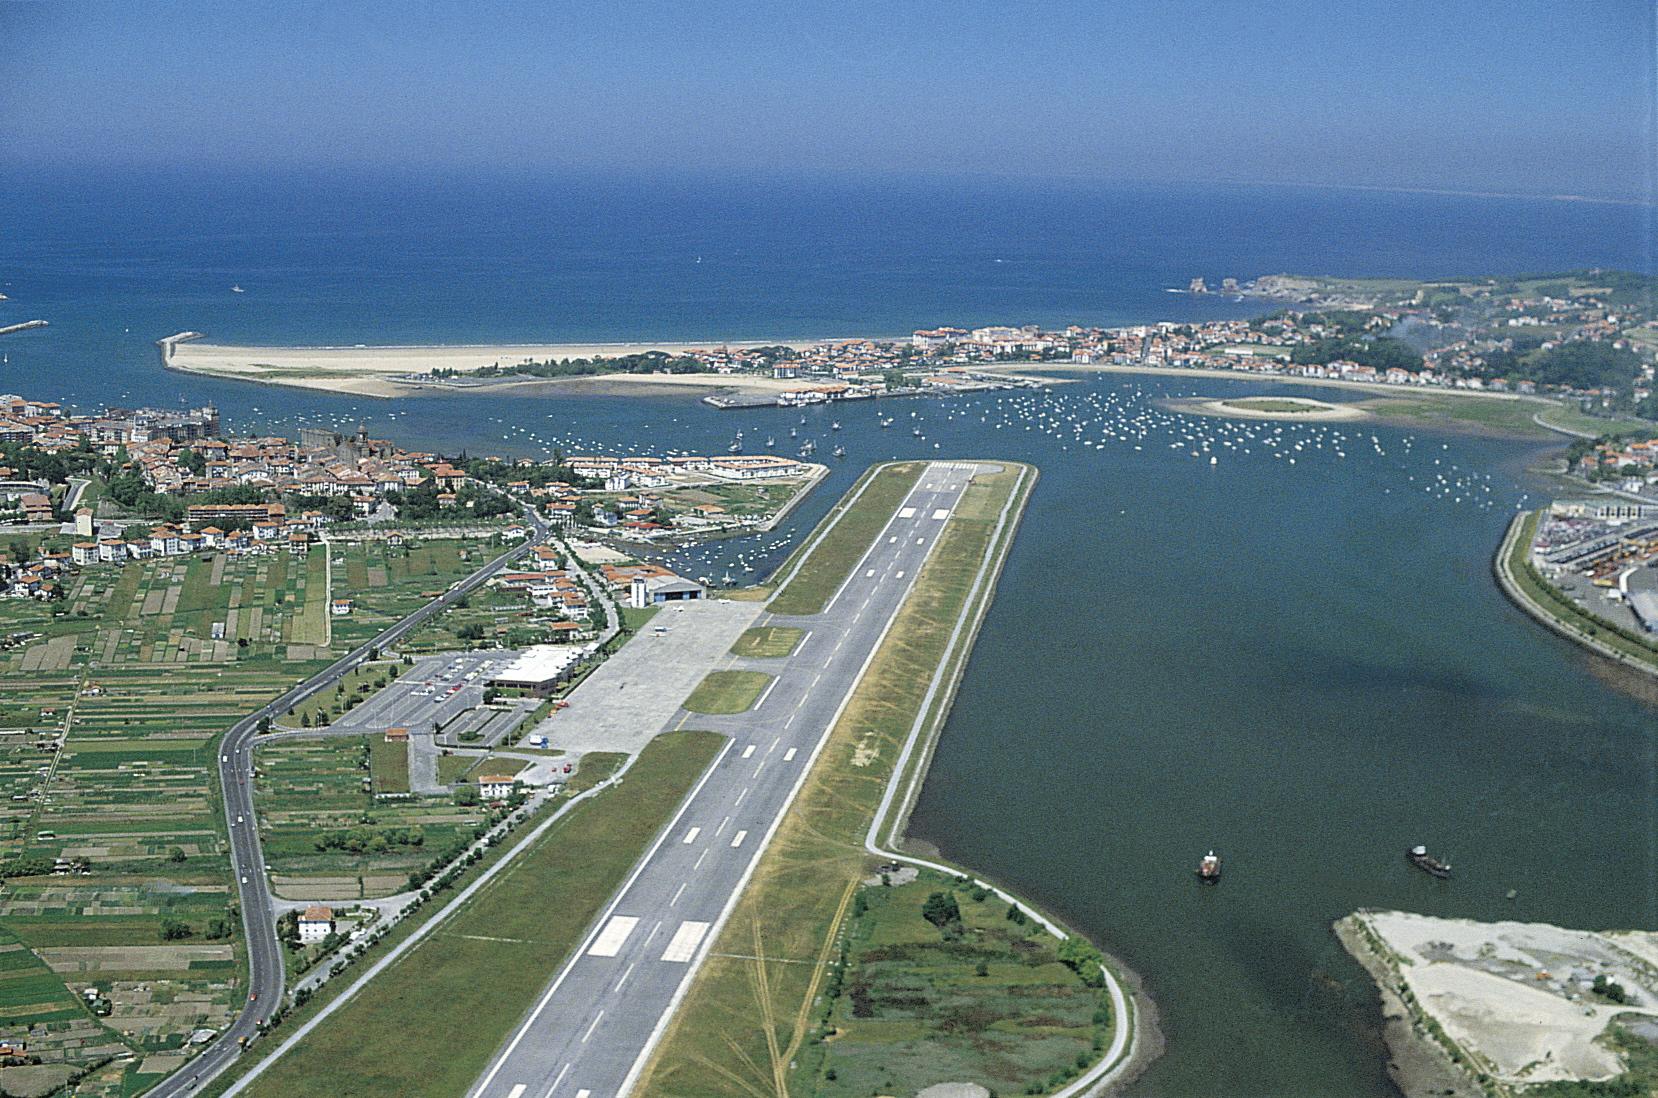 San Sebastian Airport from the air